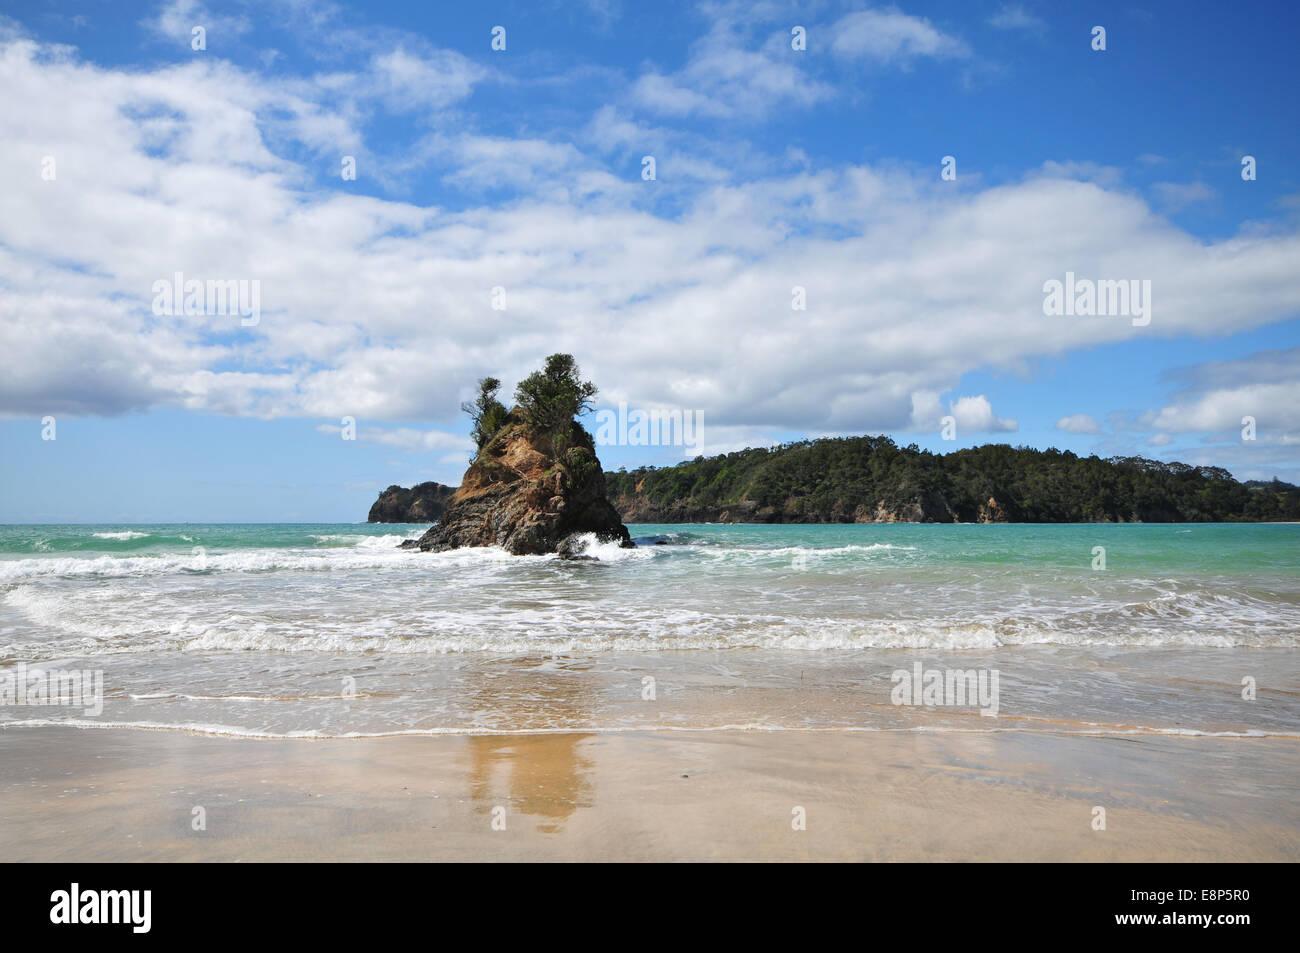 Flat sandy beach with coastal rocks at low tide in Matapouri, Tutukaka Coast in New Zealand. Stock Photo